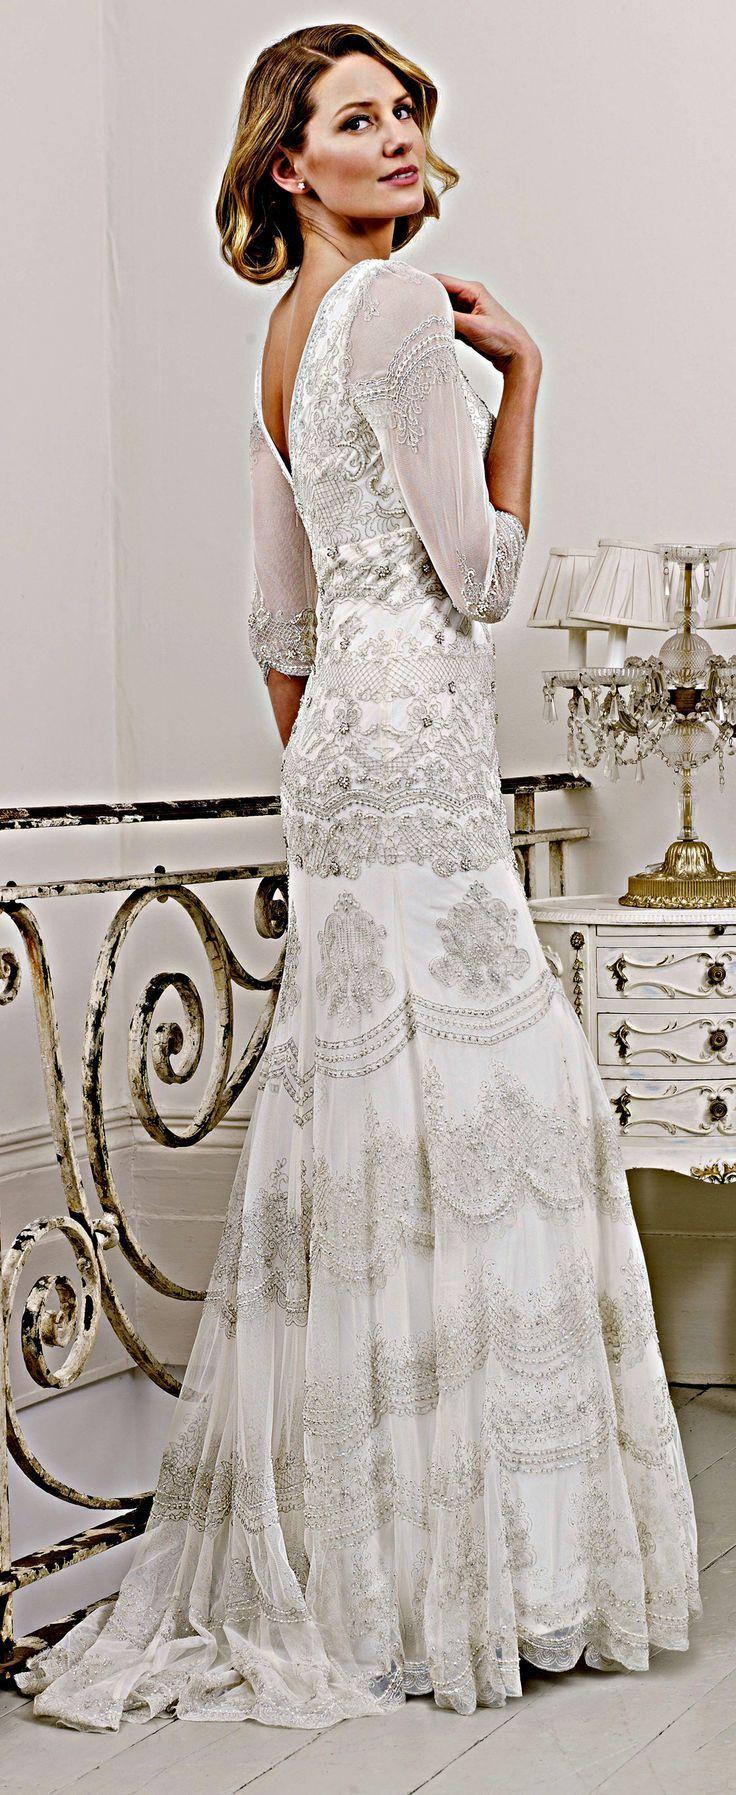 17 Best ideas about Older Bride on Pinterest | Wedding dresses